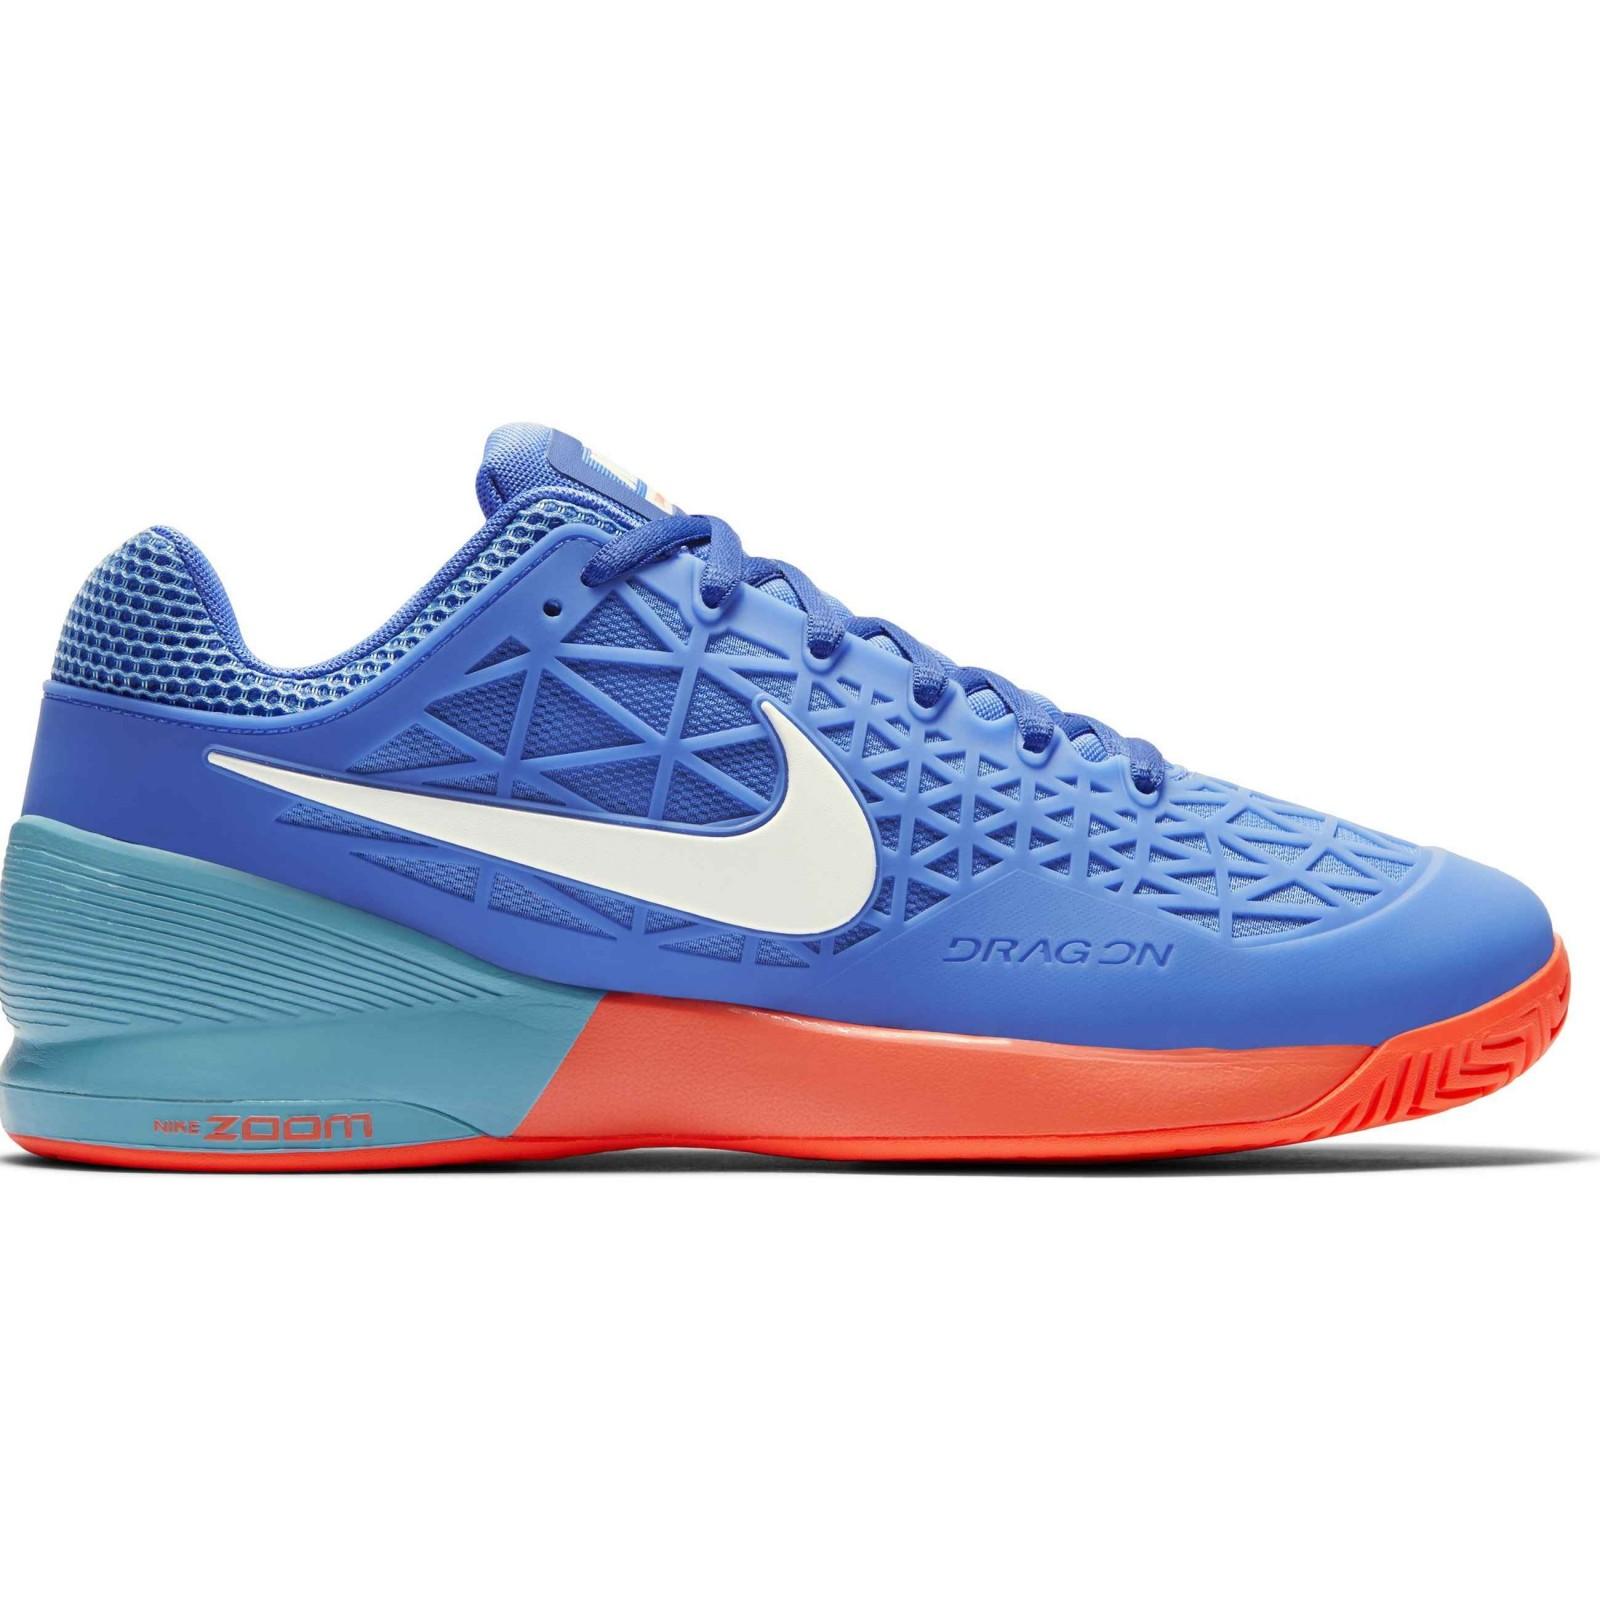 3d4ff1877f5 Pánské tenisové boty Nike ZOOM CAGE 2 EU